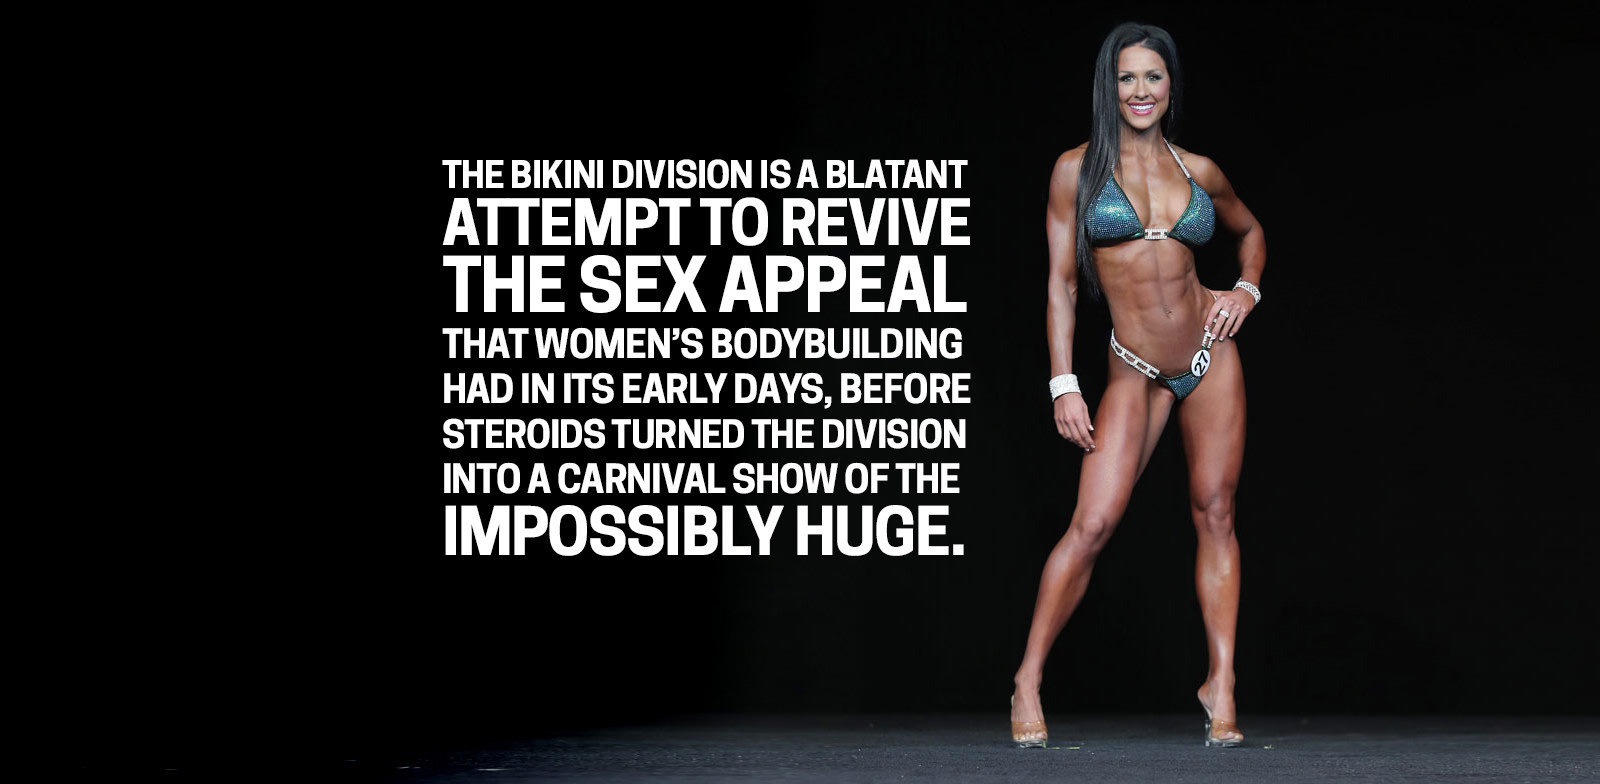 Bodybuilder hookup meme funny no commitment cell